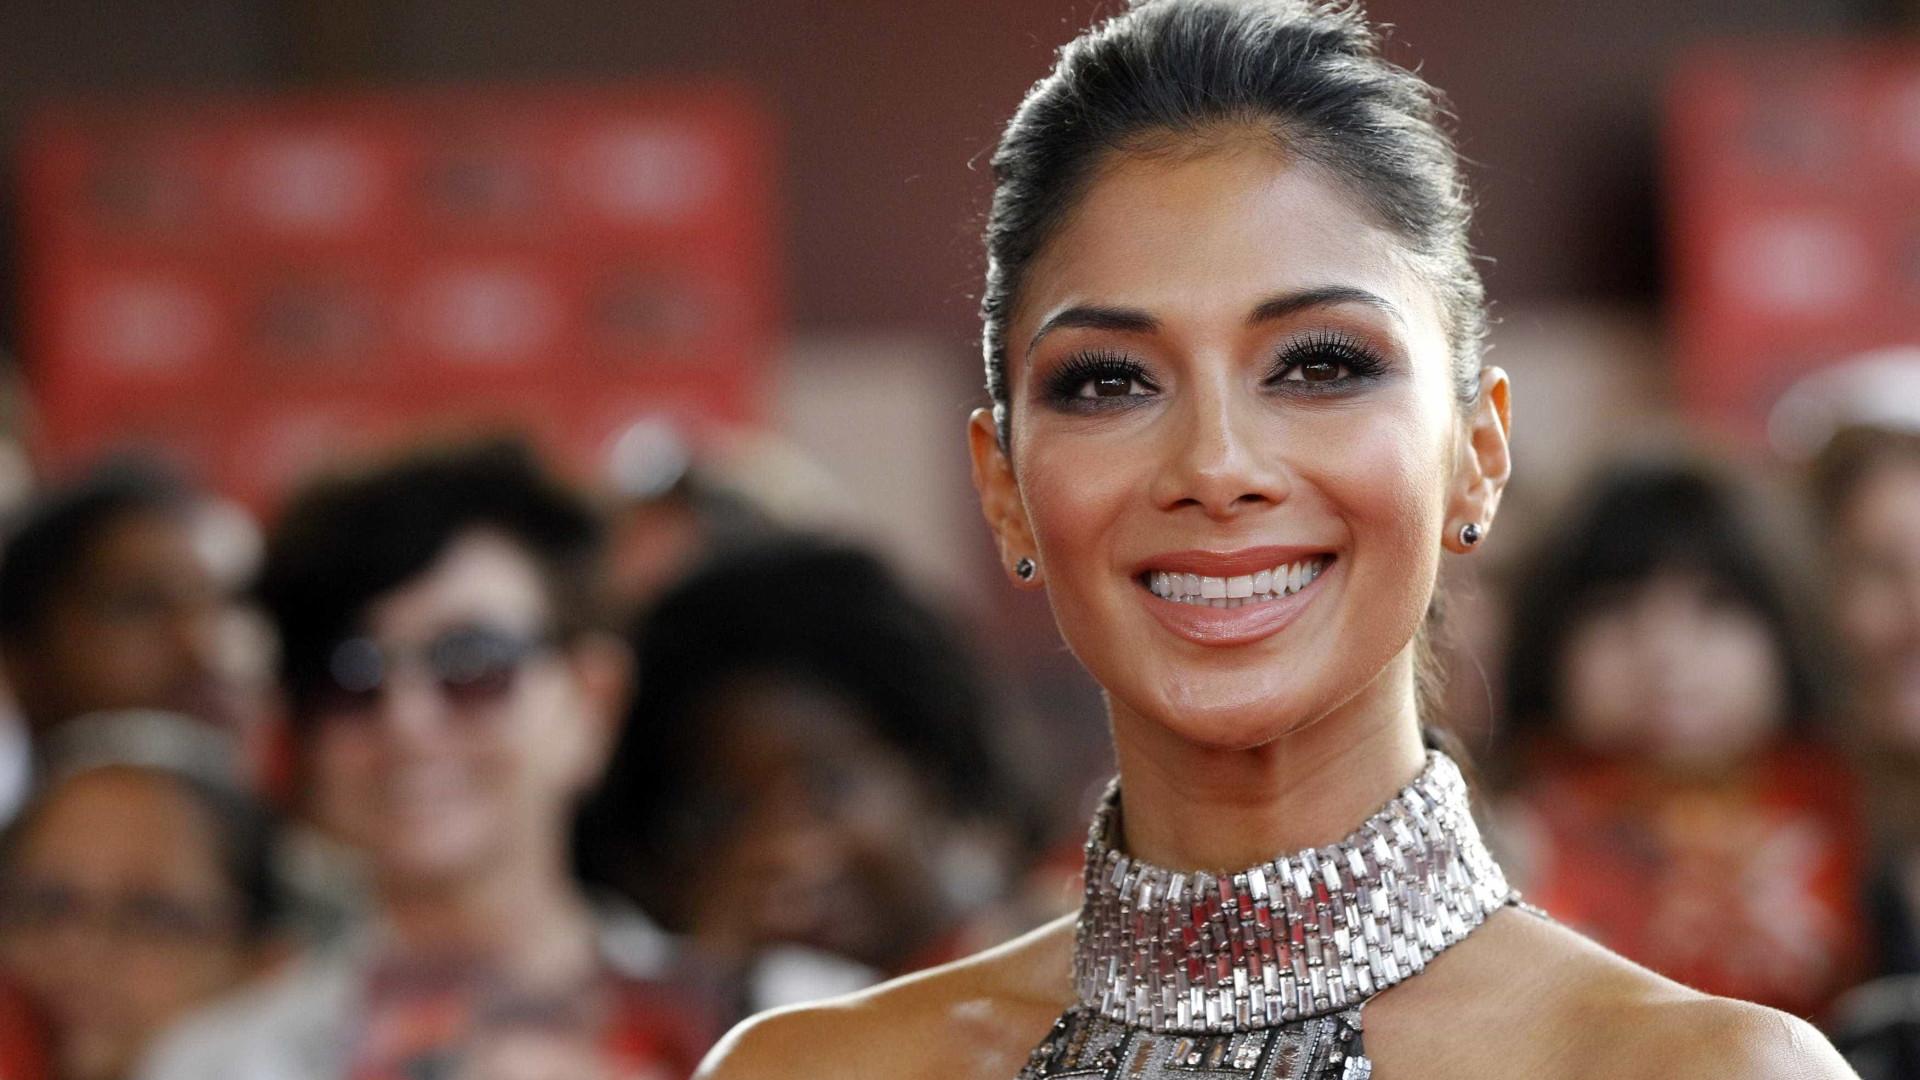 Nicole Scherzinger, ex-Pussycat Dolls, revela luta contra a bulimia